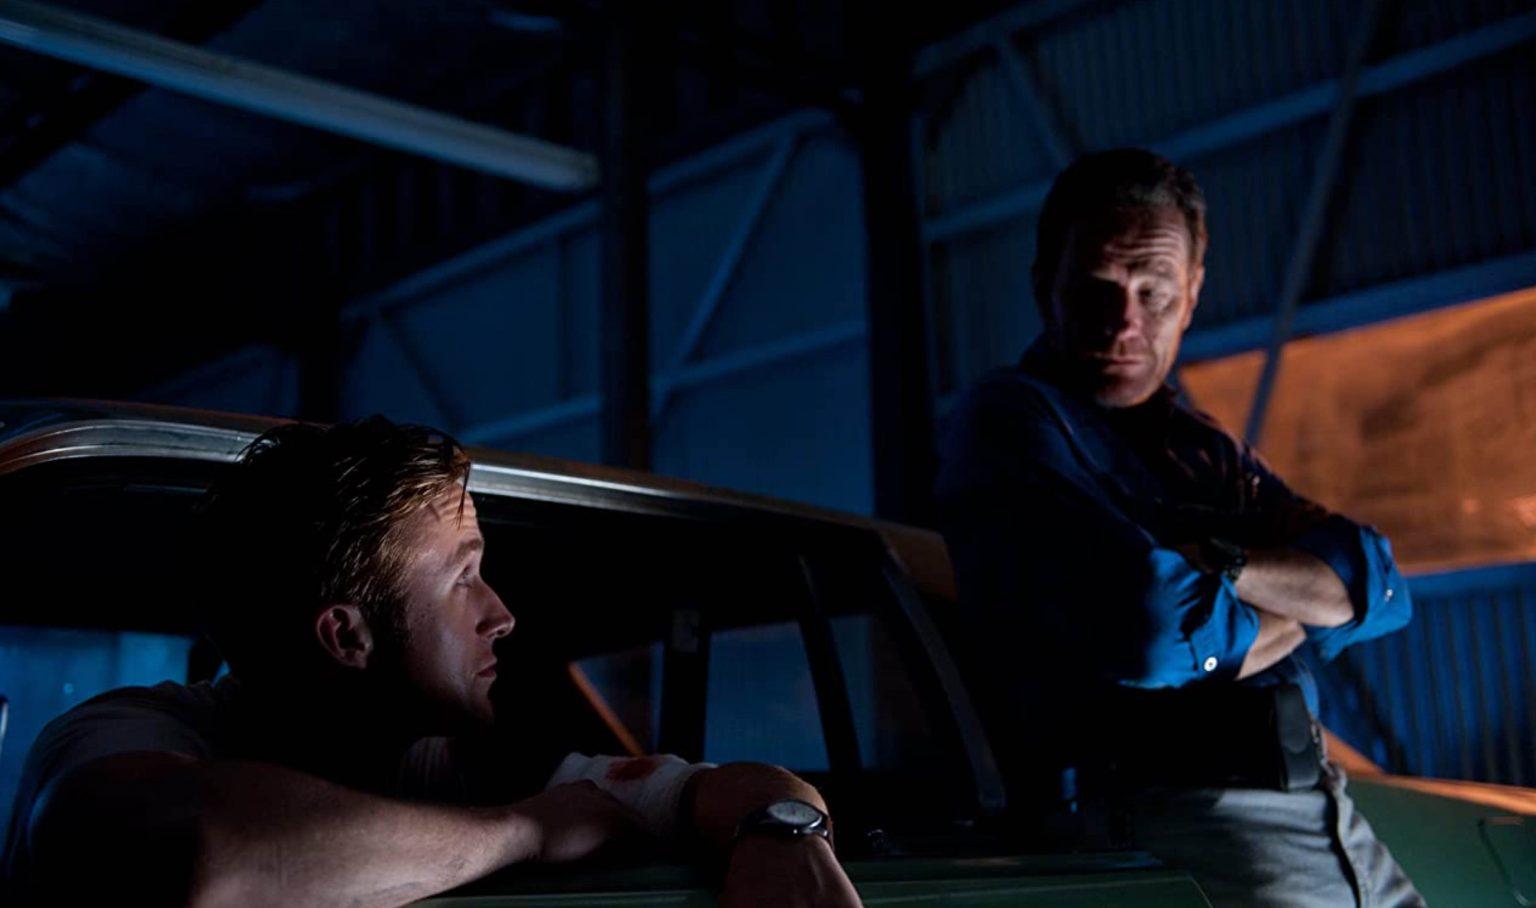 Bryan Canston & Ryan Gosling - MWM Studios – All Rights Reserved